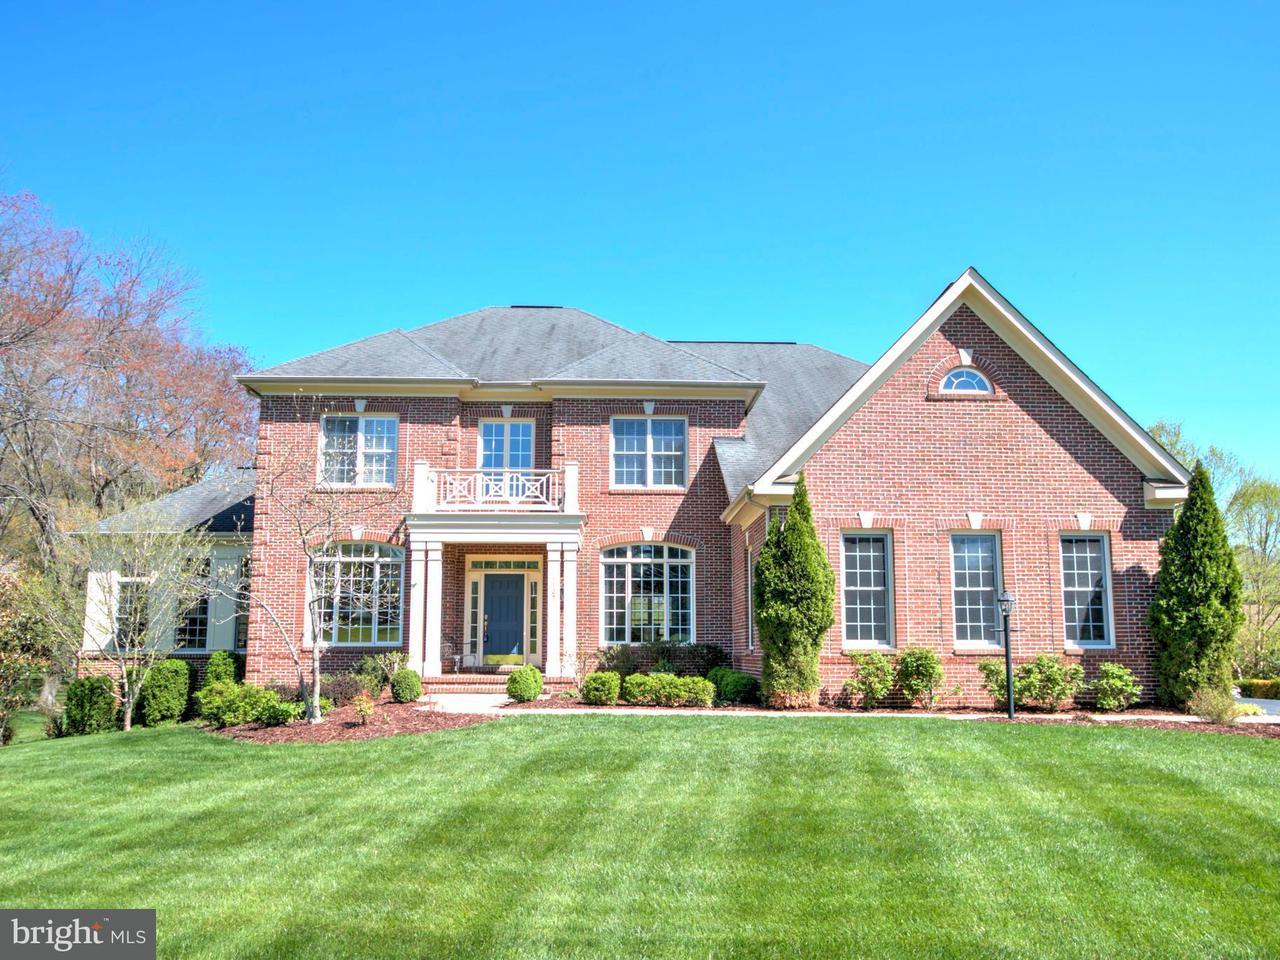 獨棟家庭住宅 為 出售 在 1125 Clinch Road 1125 Clinch Road Herndon, 弗吉尼亞州 20170 美國